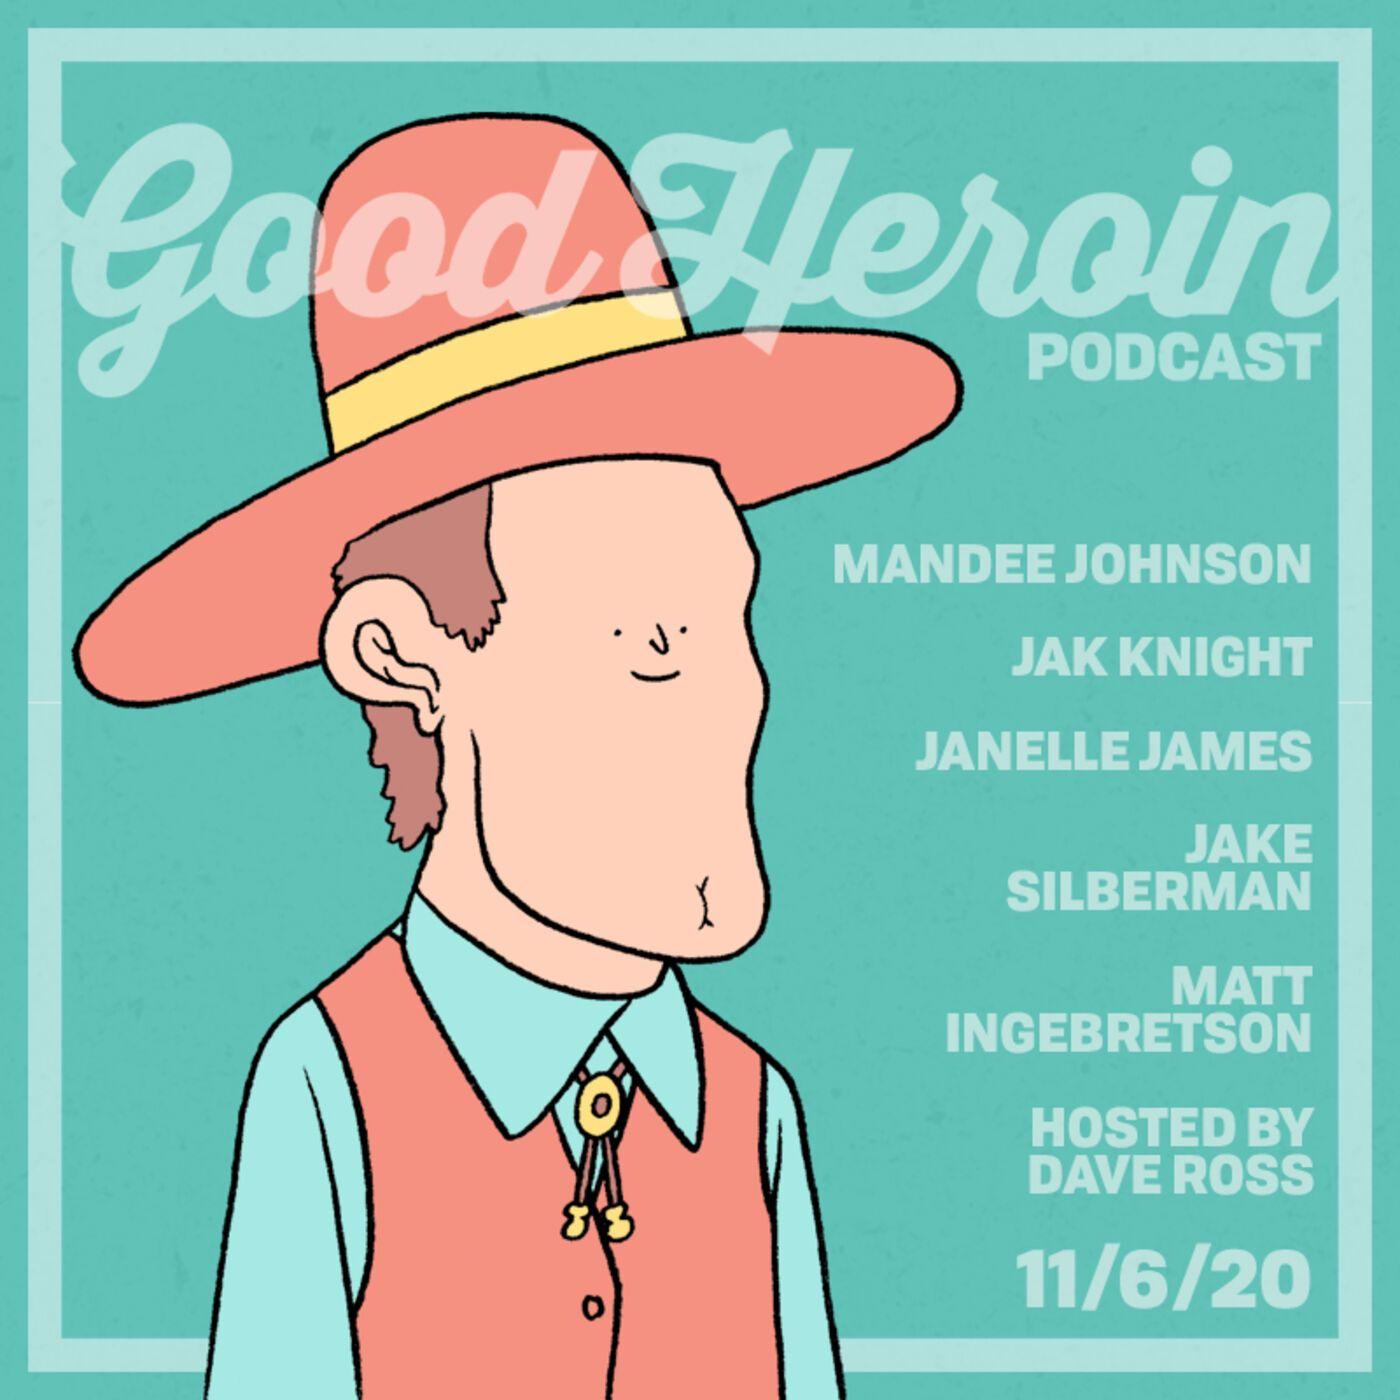 #31 Mandee Johnson, Jak Knight, Janelle James, Jake Silberman & Matt Ingebretson